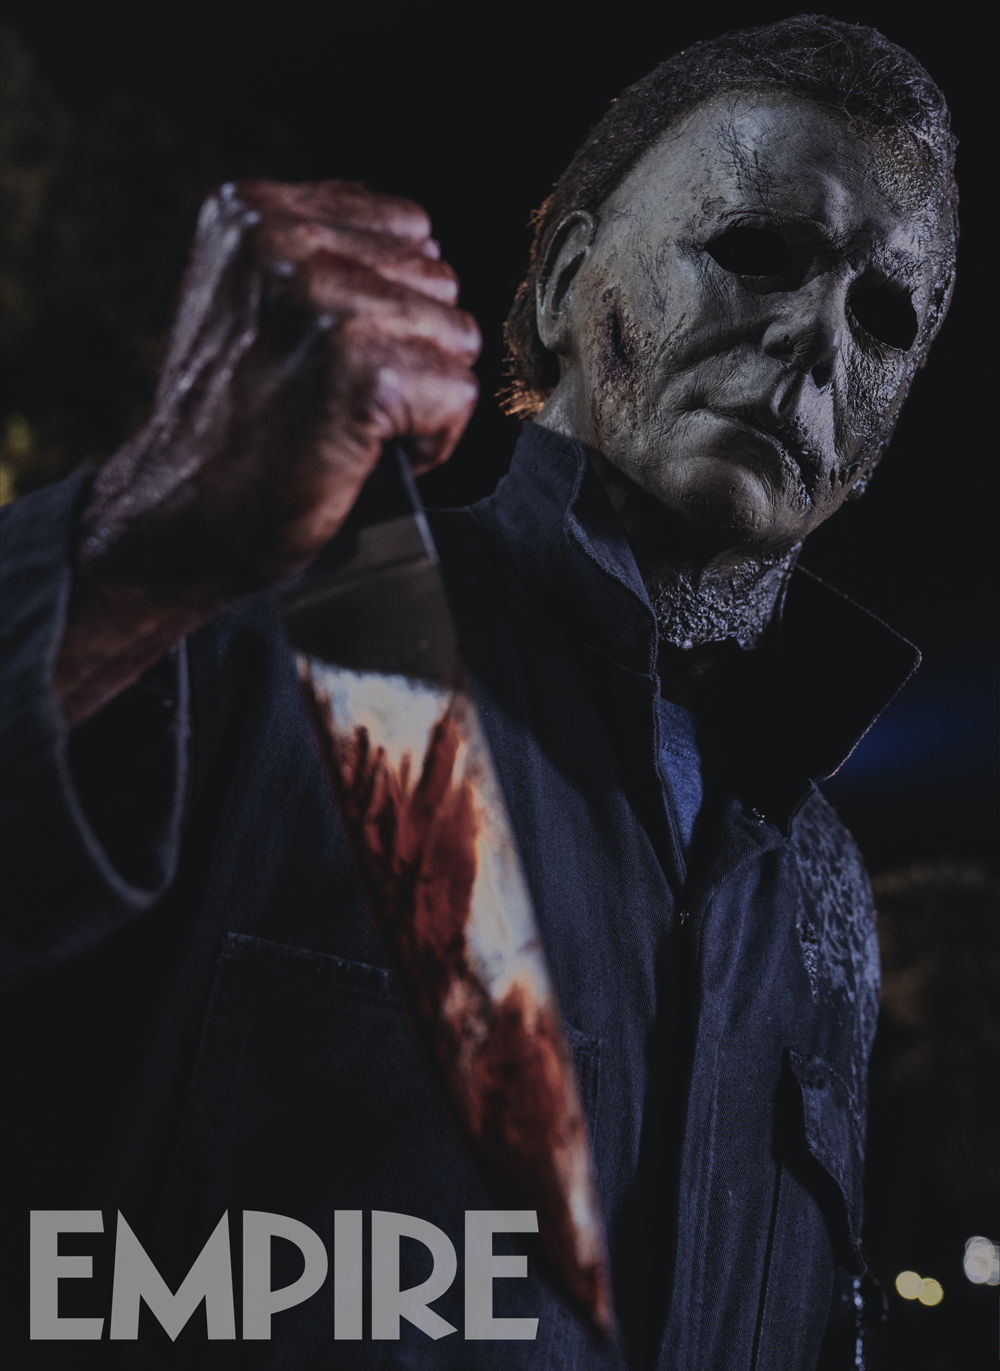 Michael Myers masque calciné Halloween Kills